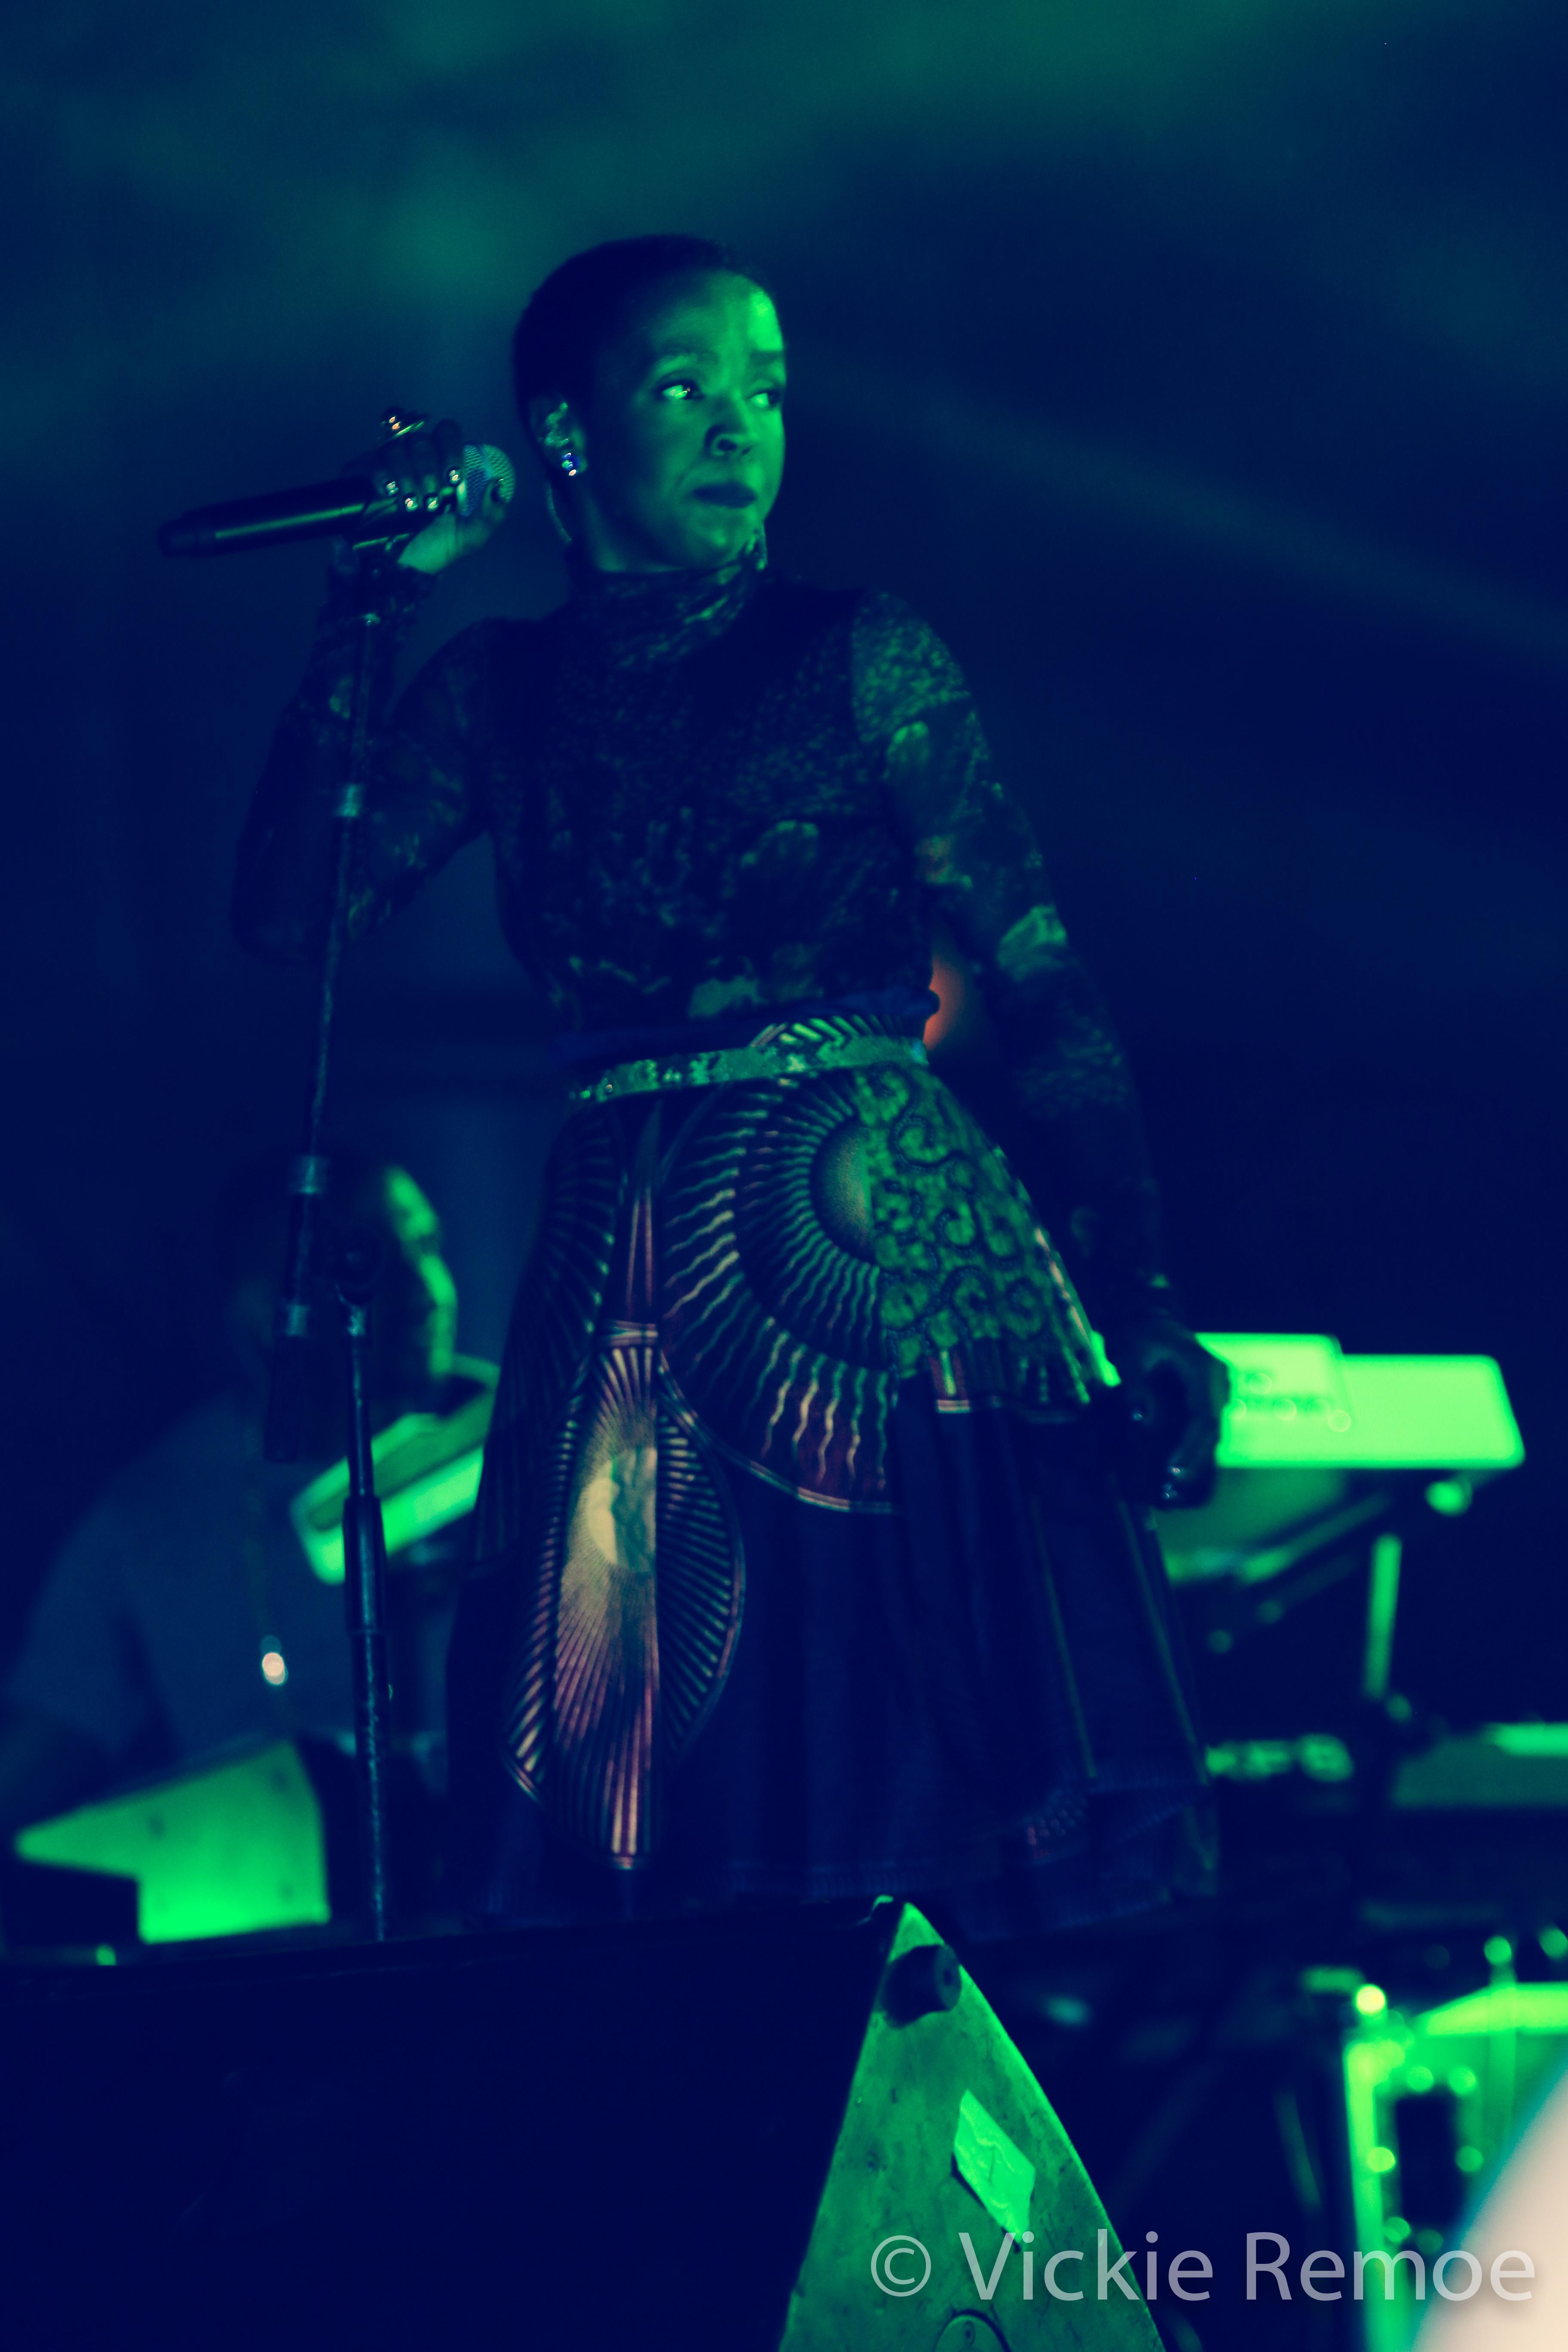 LaurynHillinGhana_Wanlov_BBNZ-Concert_StoneBoy-MissV-2014-12